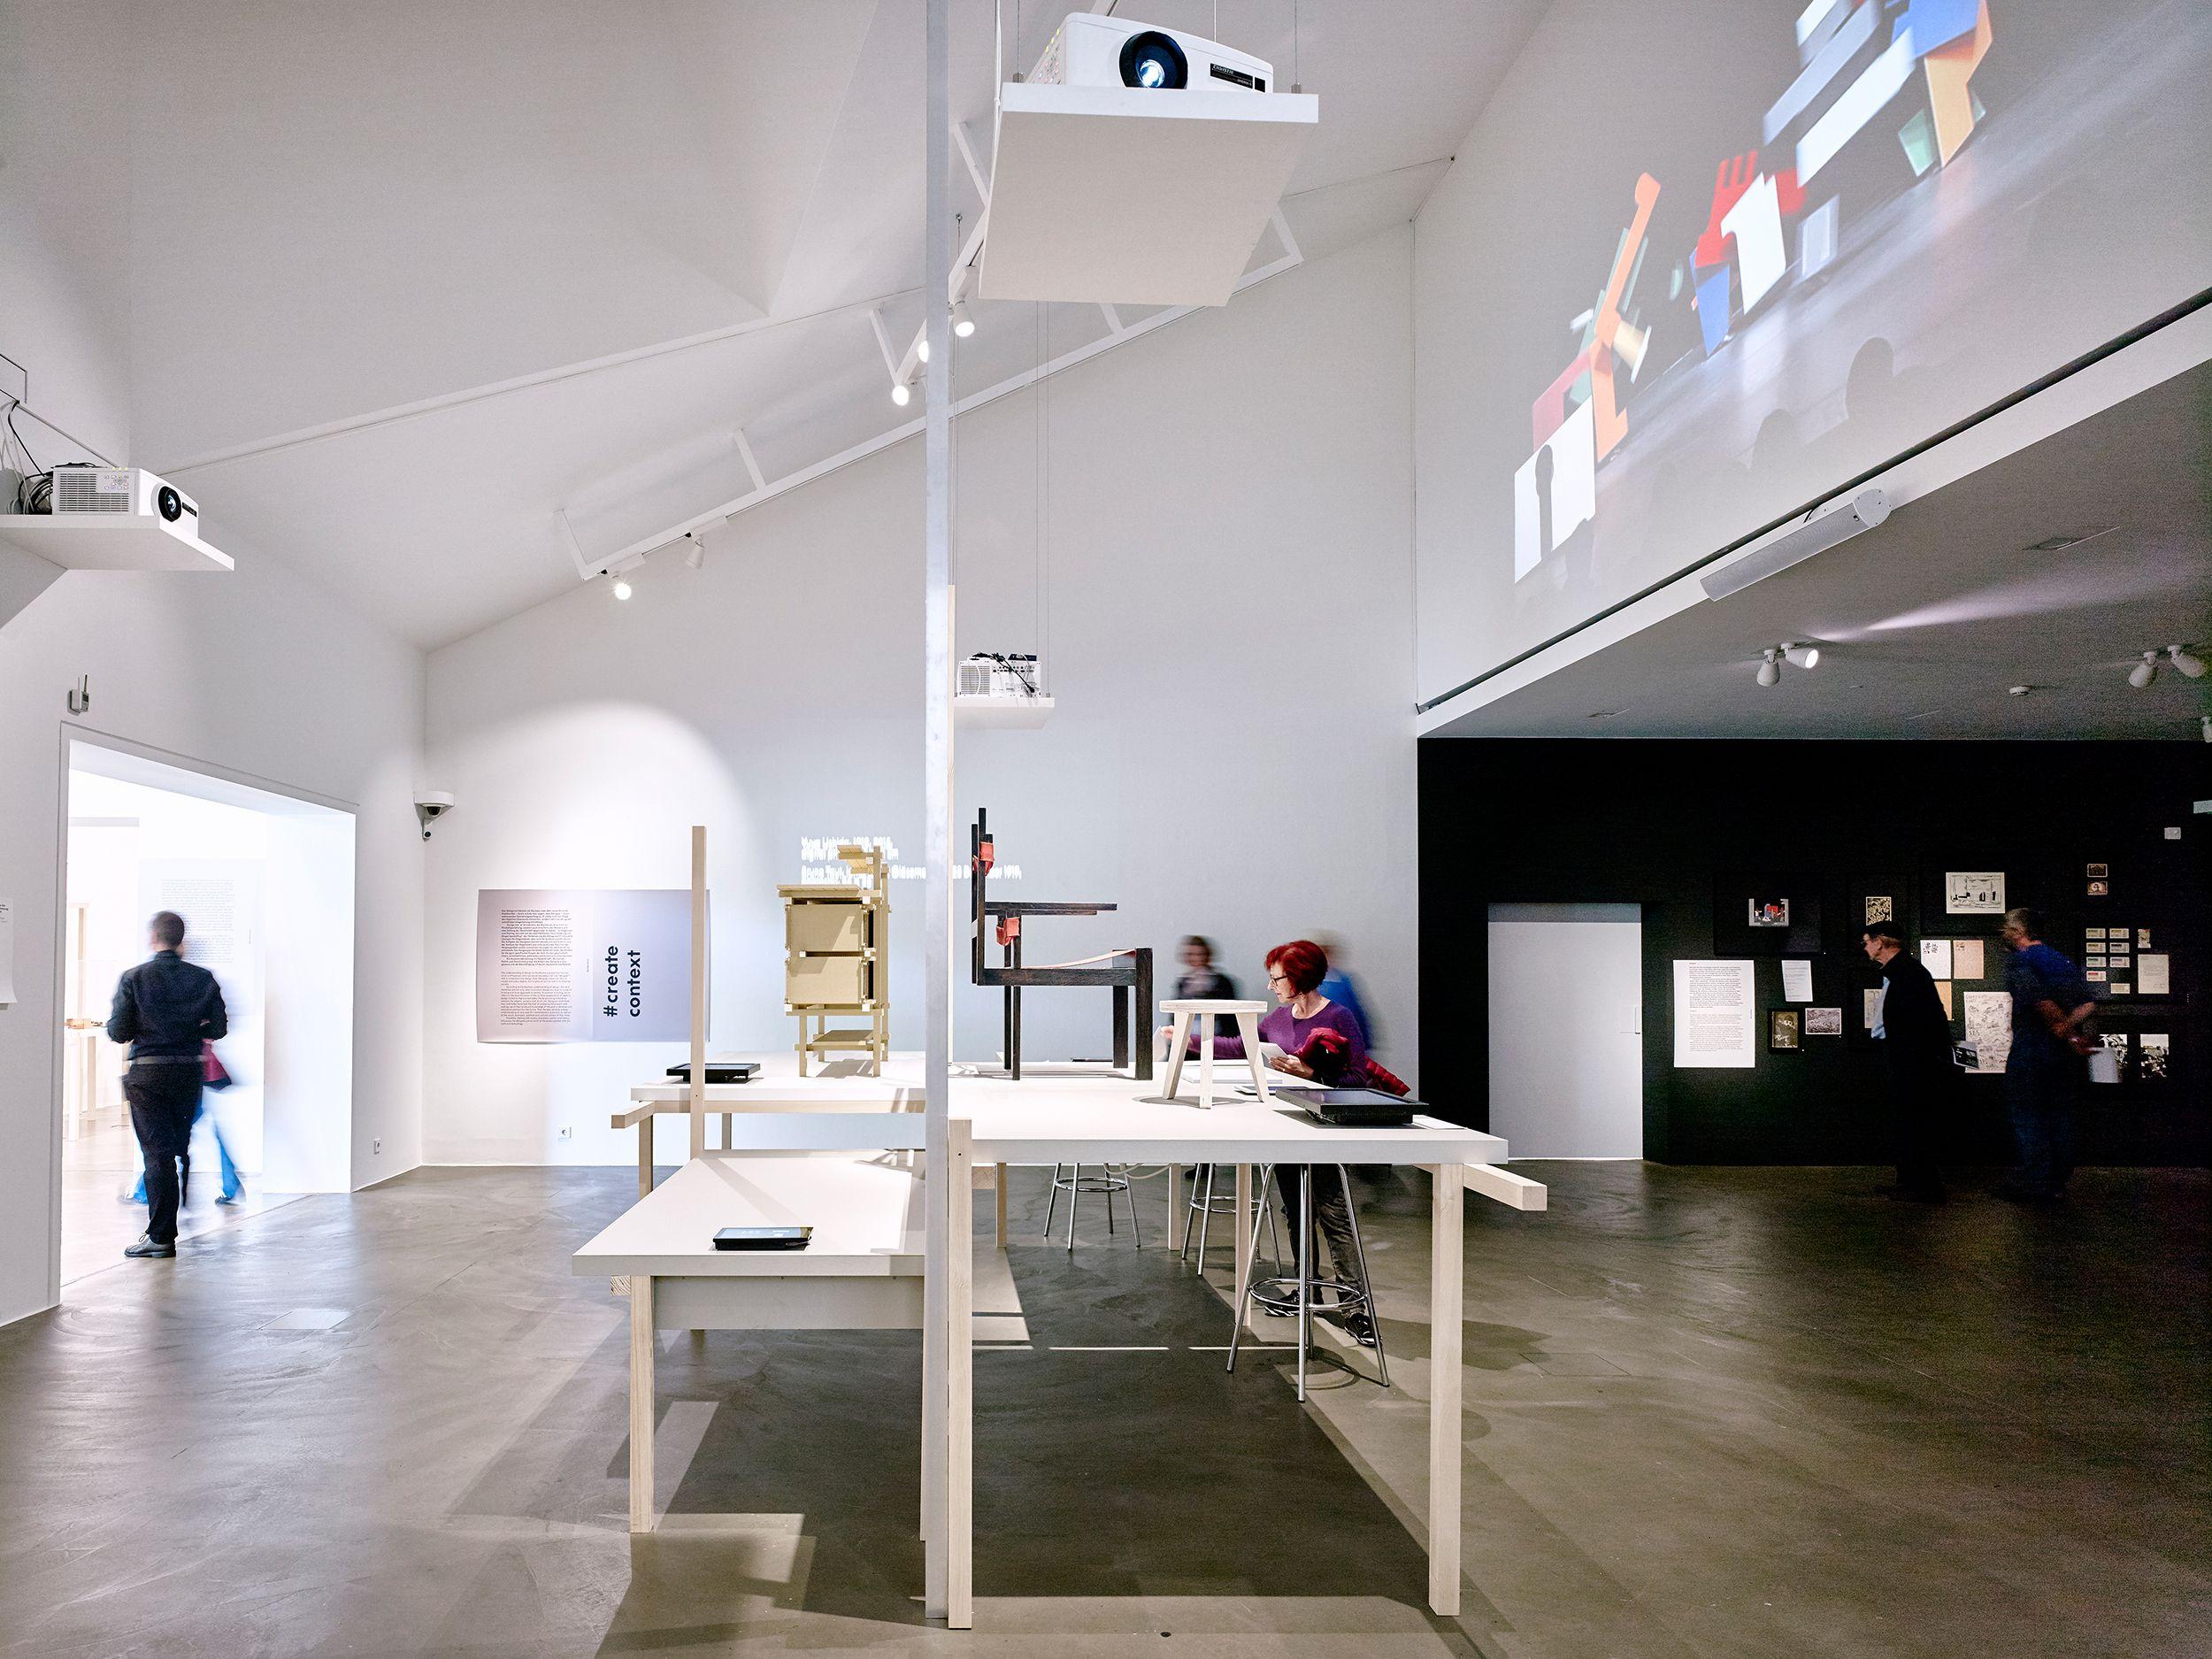 The Bauhaus itsalldesign exhibition at the Vitra Design